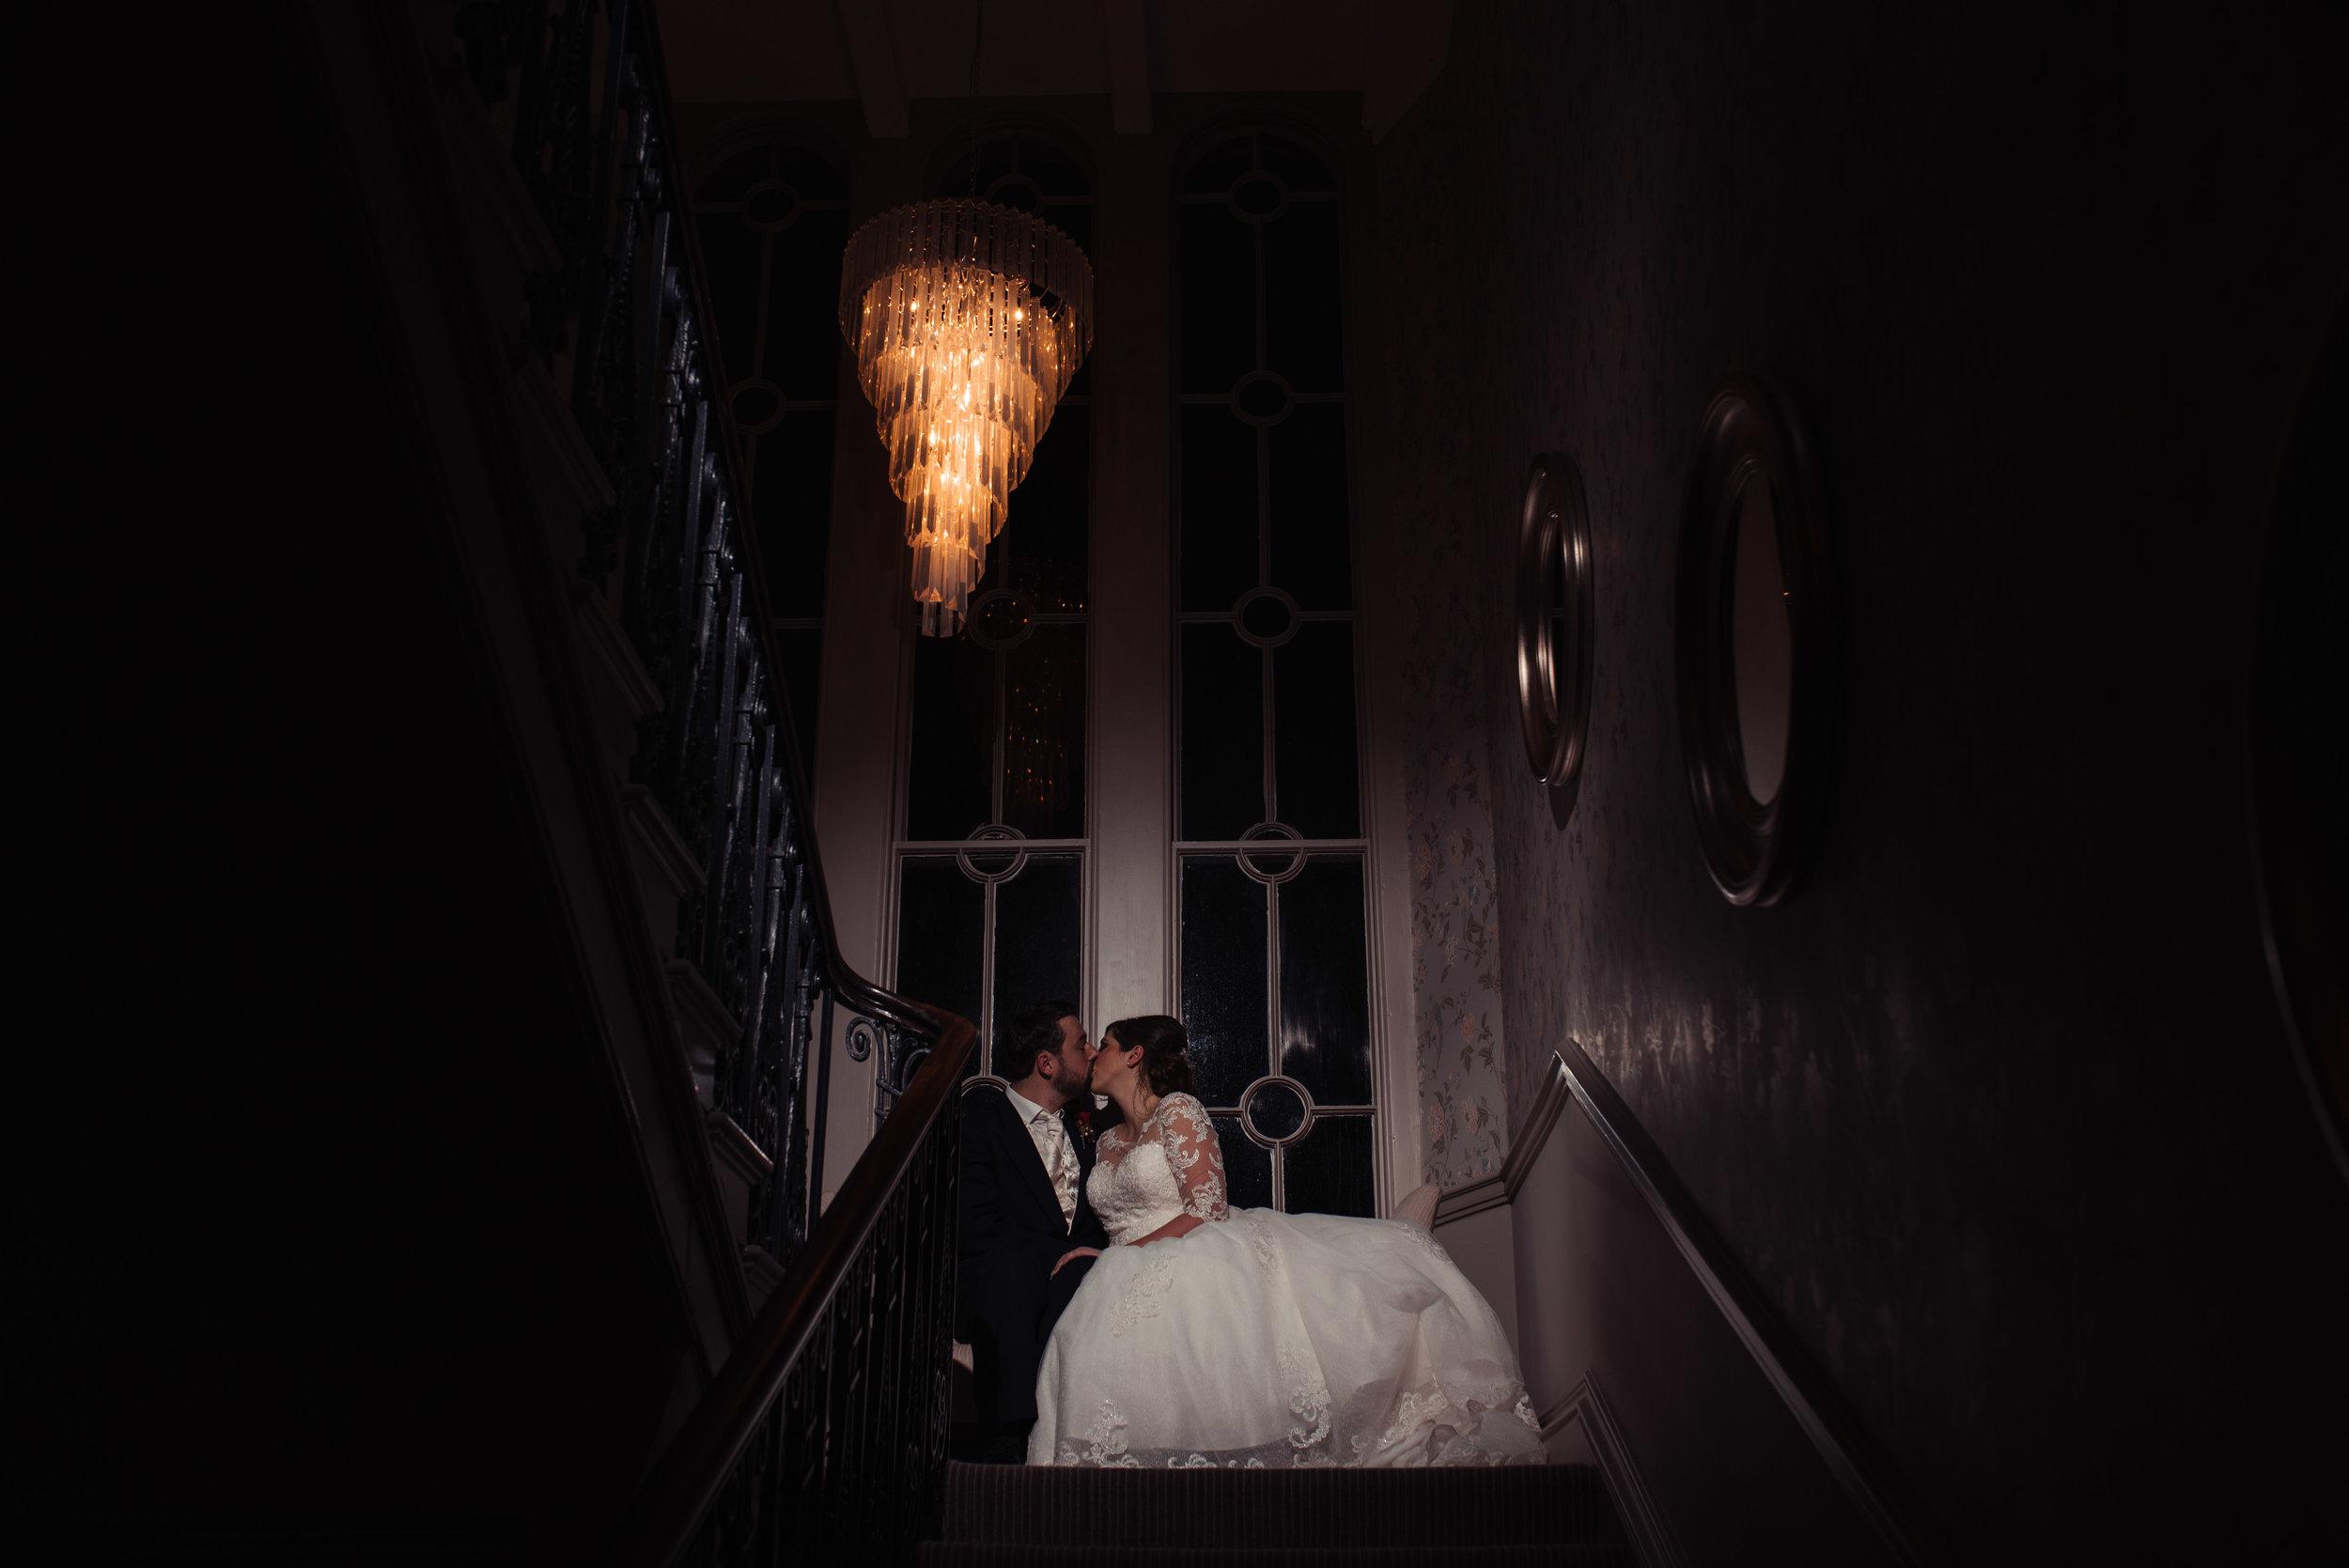 Belsfield-wedding-photography-48.jpg